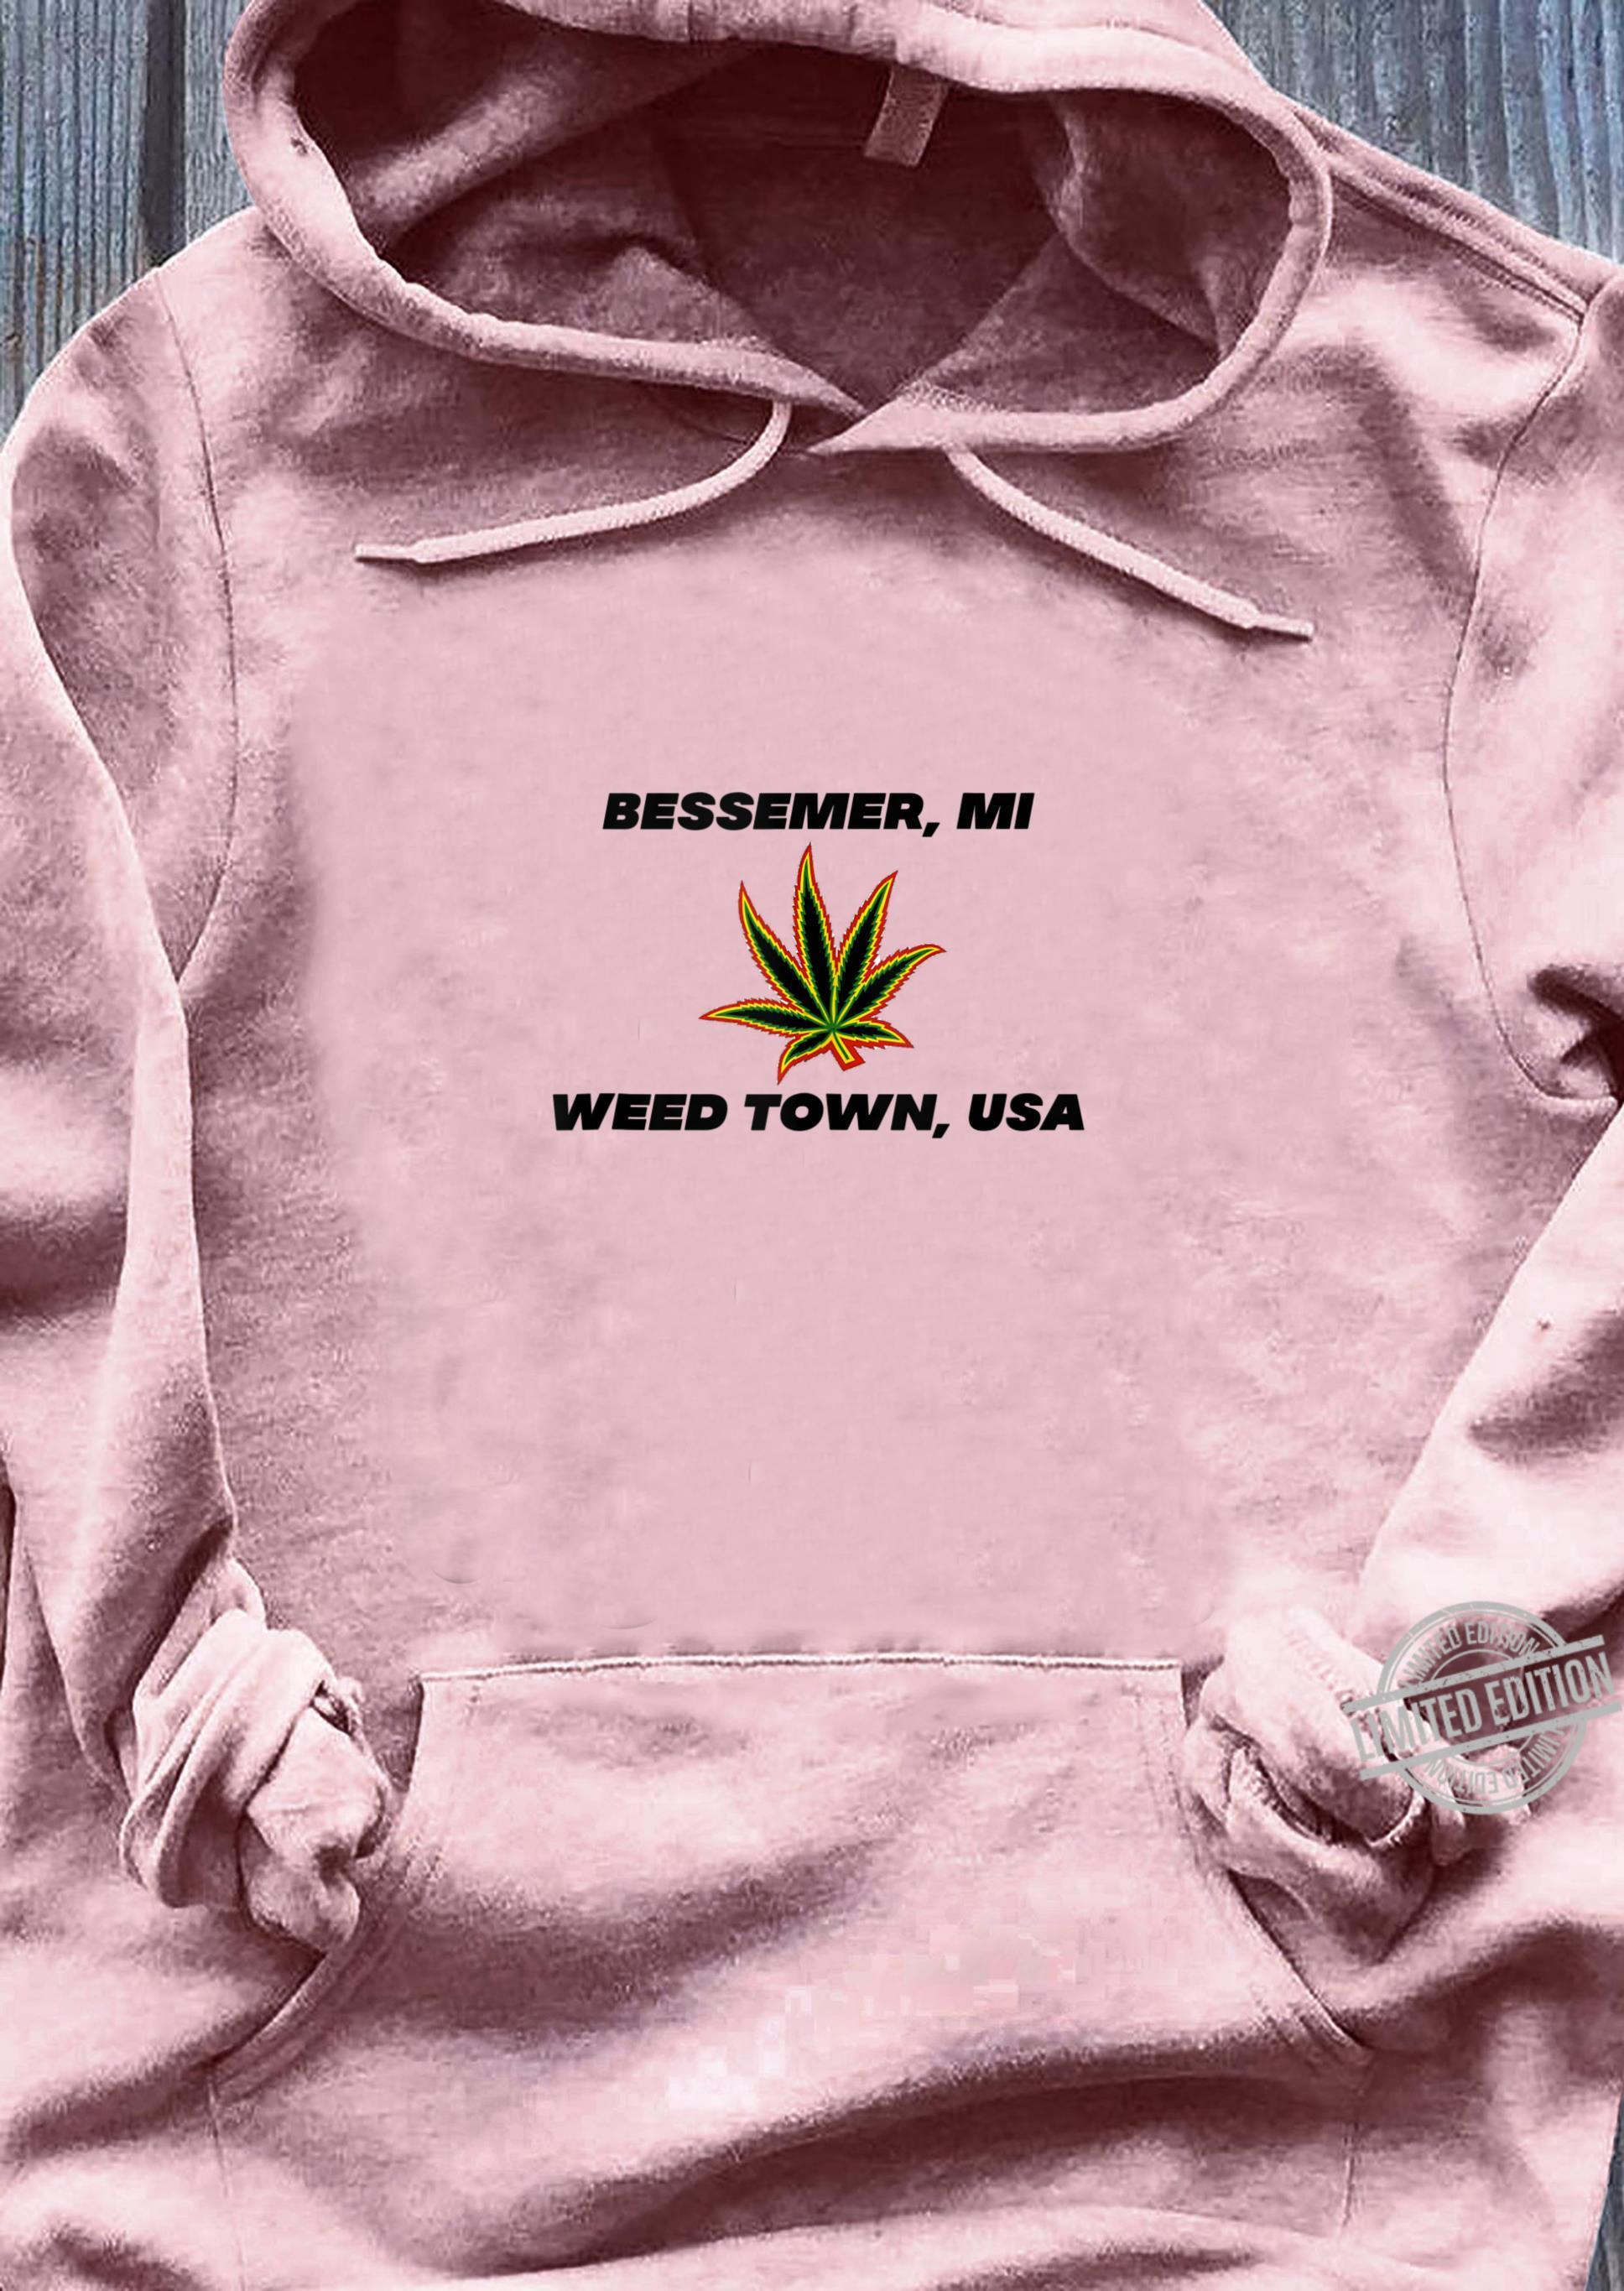 49911 Bessemer Michigan Weed Town, USA Shirt ladies tee